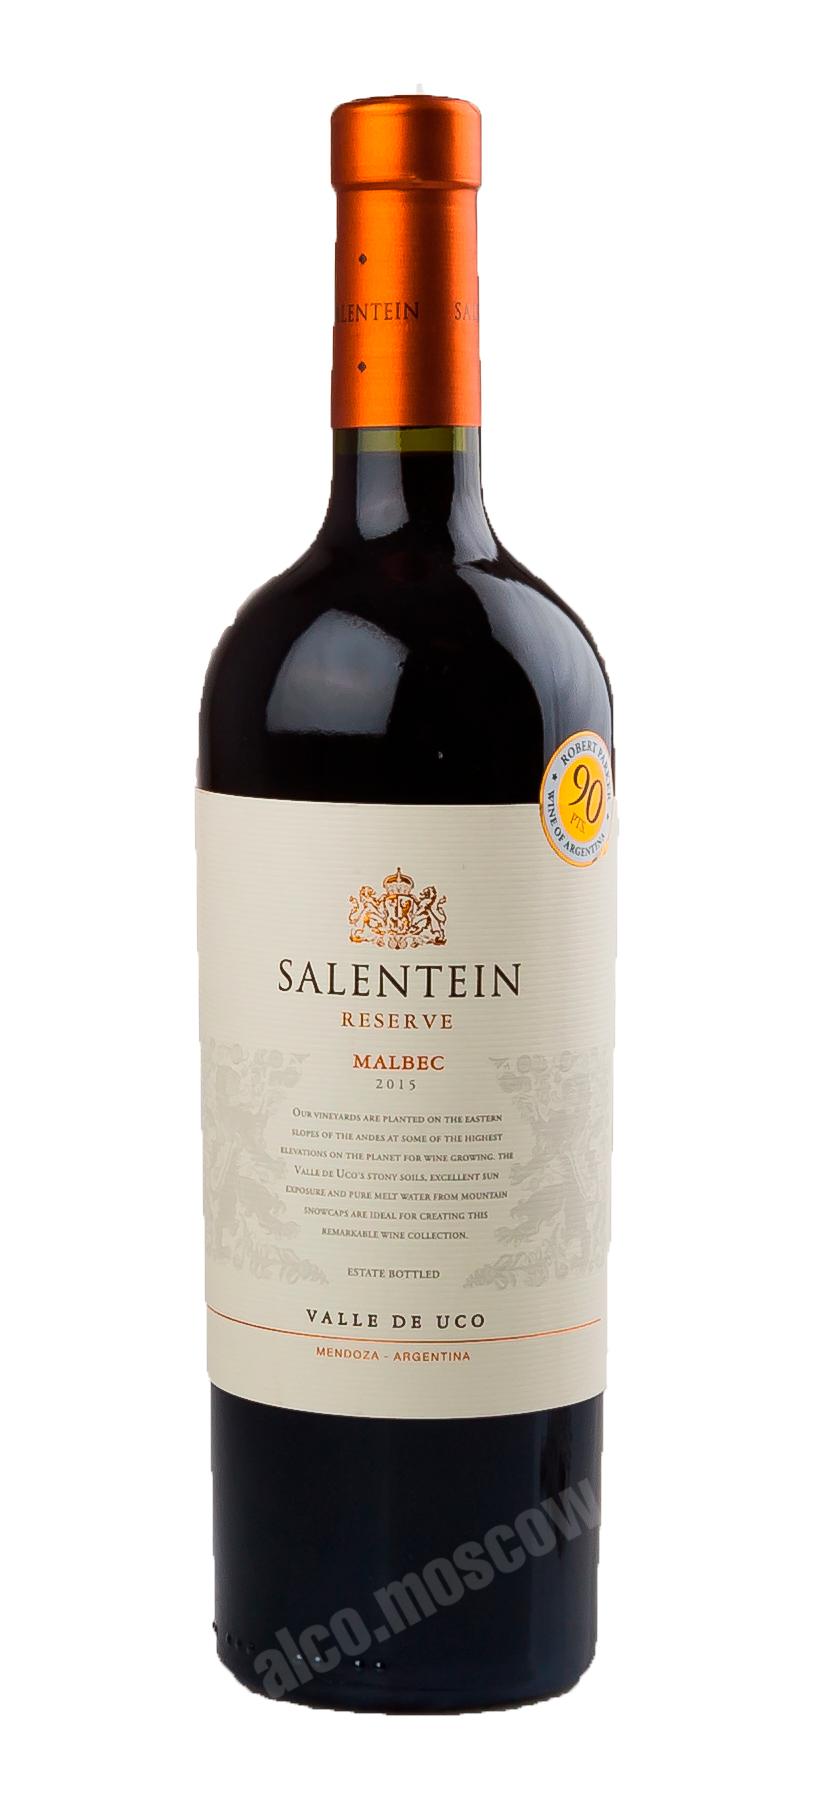 Salentein Salentein Reserve Malbec аргентинское вино Салентайн Резерве Мальбек